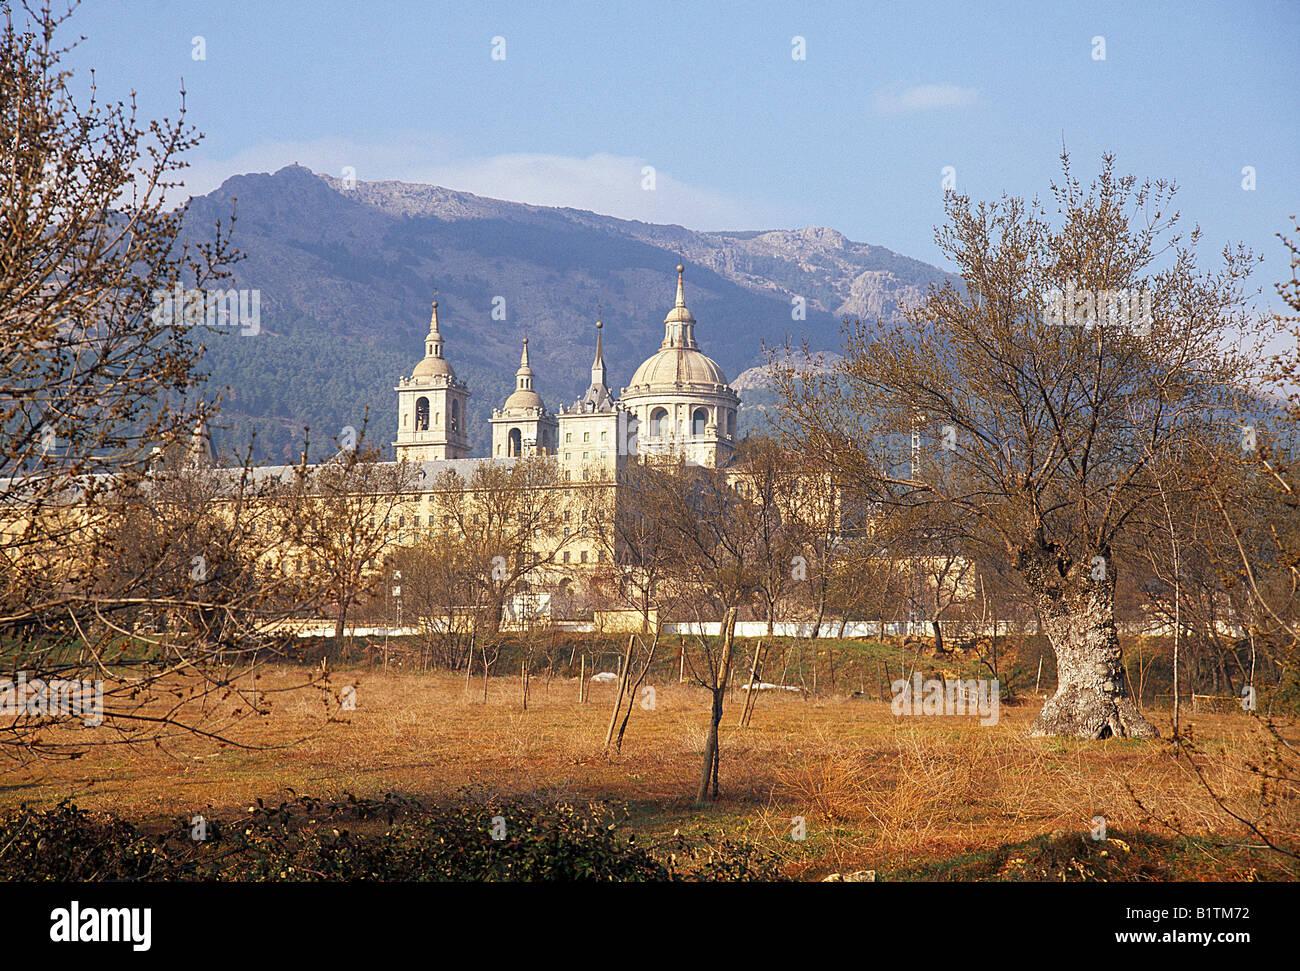 San Lorenzo de El Escorial monastery viewed from La Herreria. Madrid province. Spain. - Stock Image